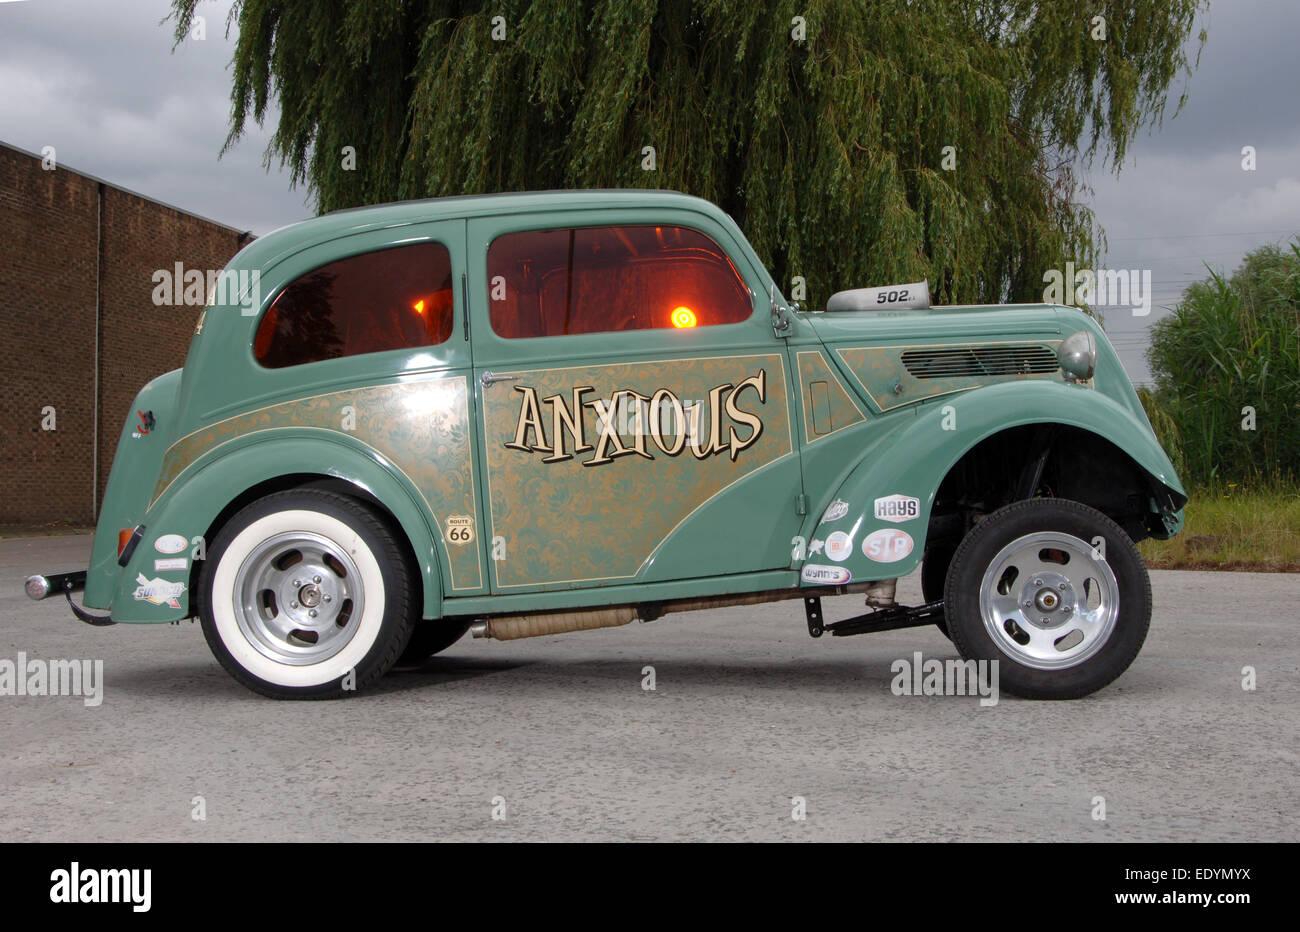 Hot Rod Cars Stock Photos & Hot Rod Cars Stock Images - Alamy